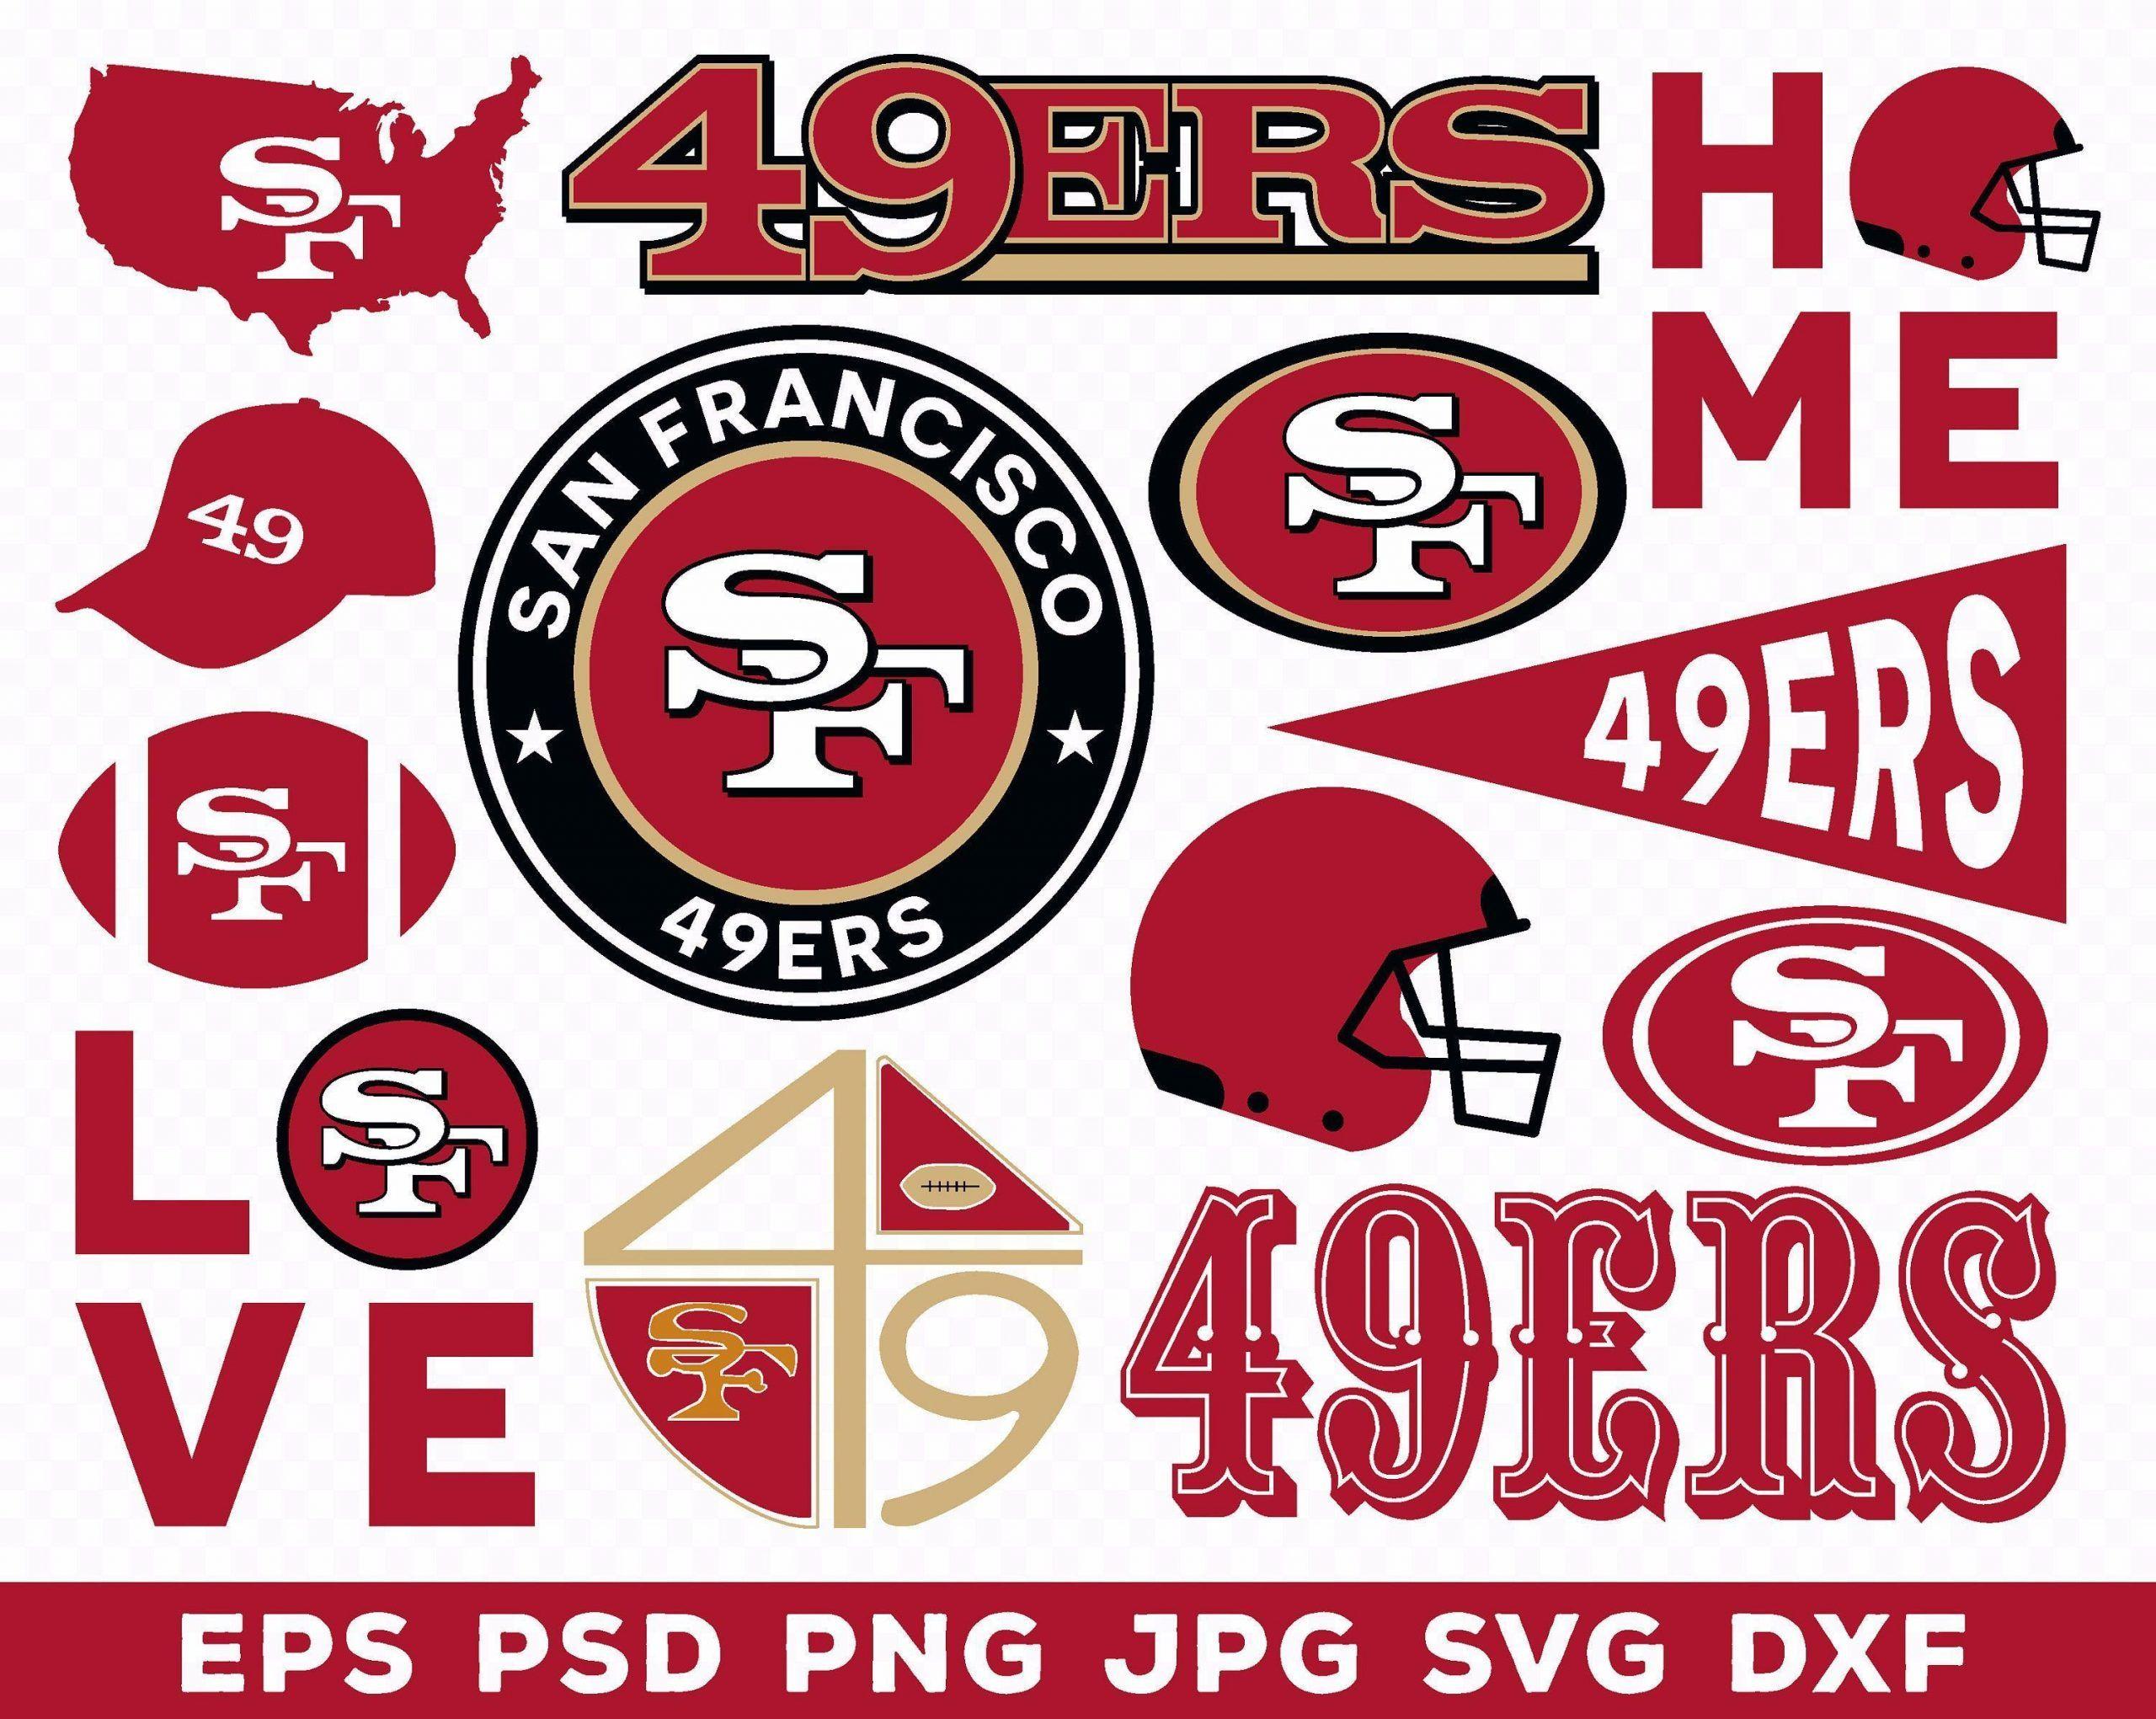 San Francisco 49ers, San Francisco 49ers logo, San